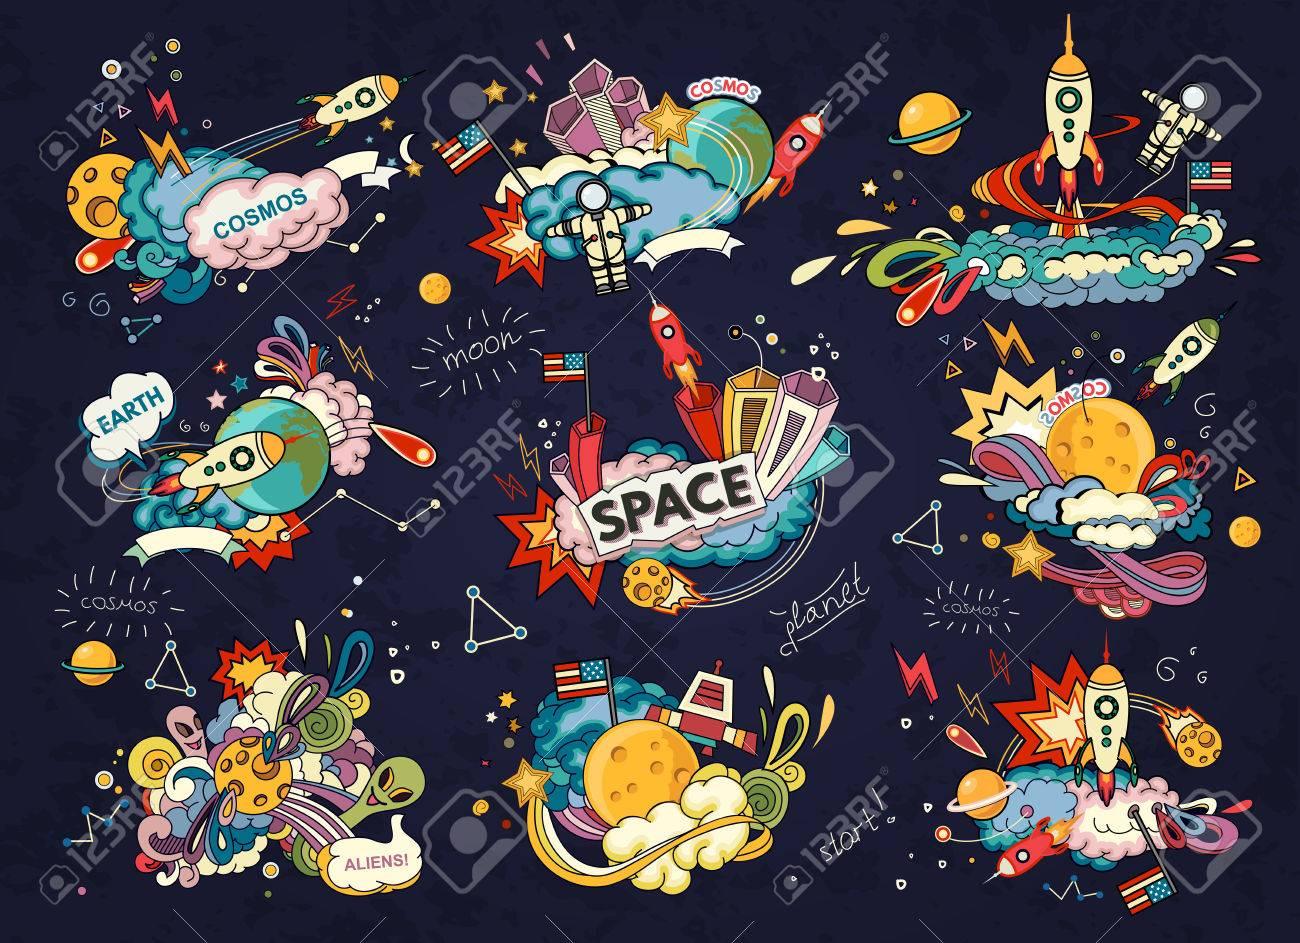 Cartoon illustration of space. Moon, planet, rocket, earth, cosmonaut, comet, universe. Classification, milky way. Abstract - 53171173